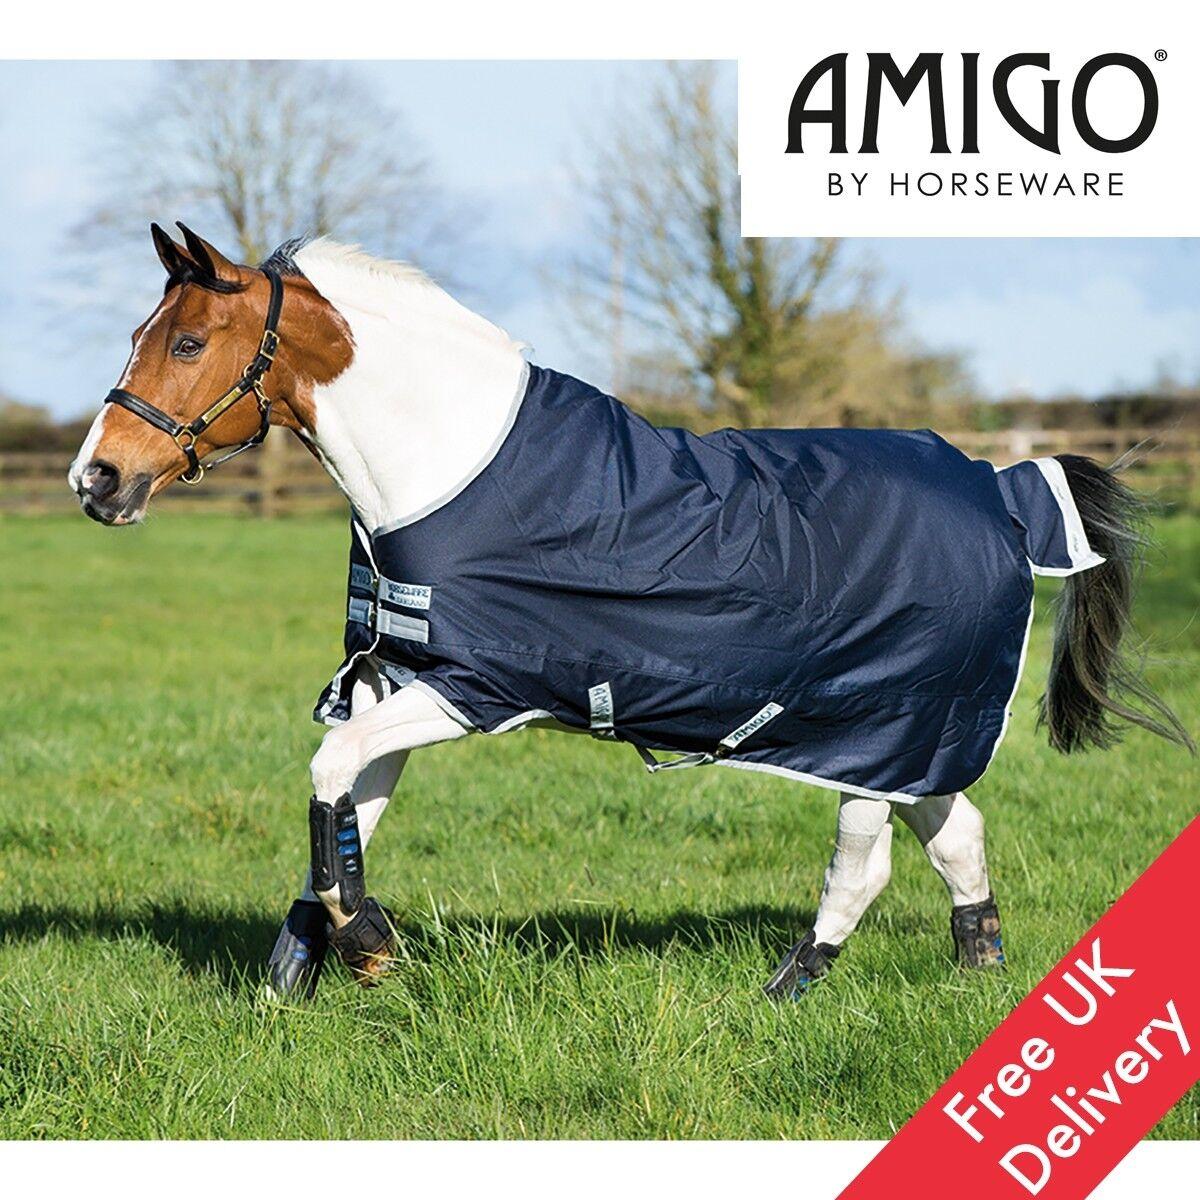 Horseware Amigo Bravo 12 0g Lightweight Turnout Rug